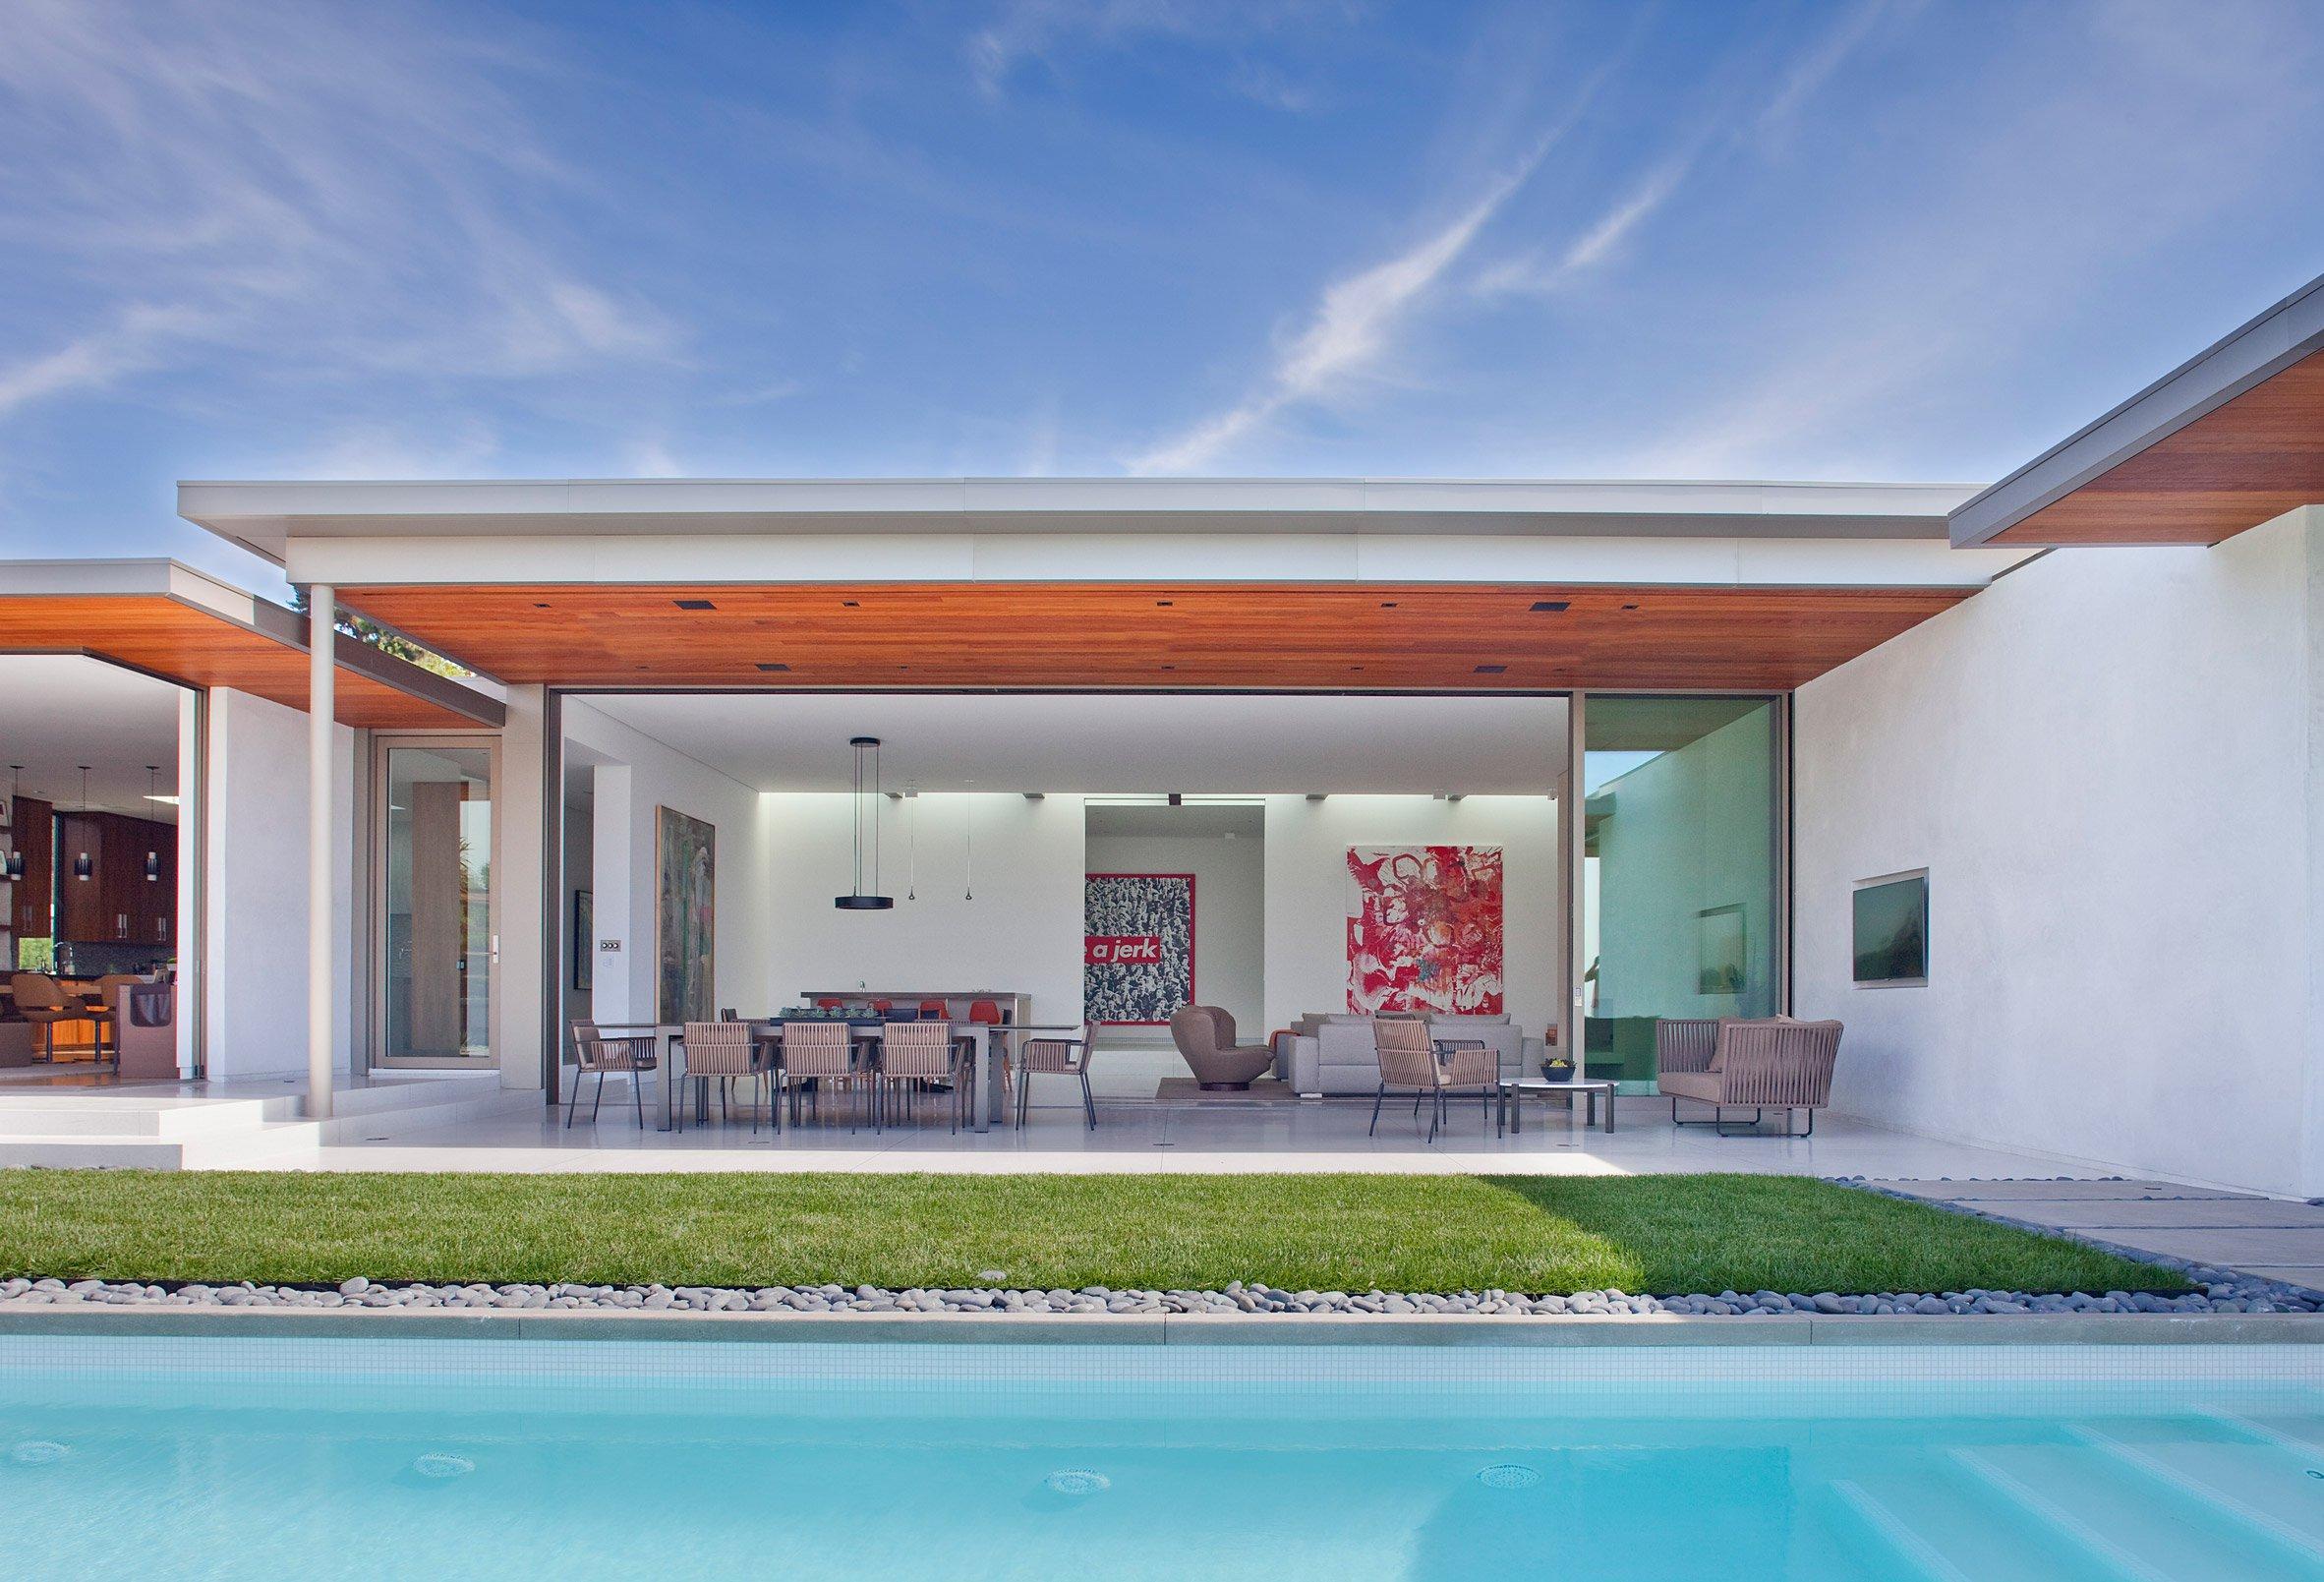 simple yet cool swimming pool design